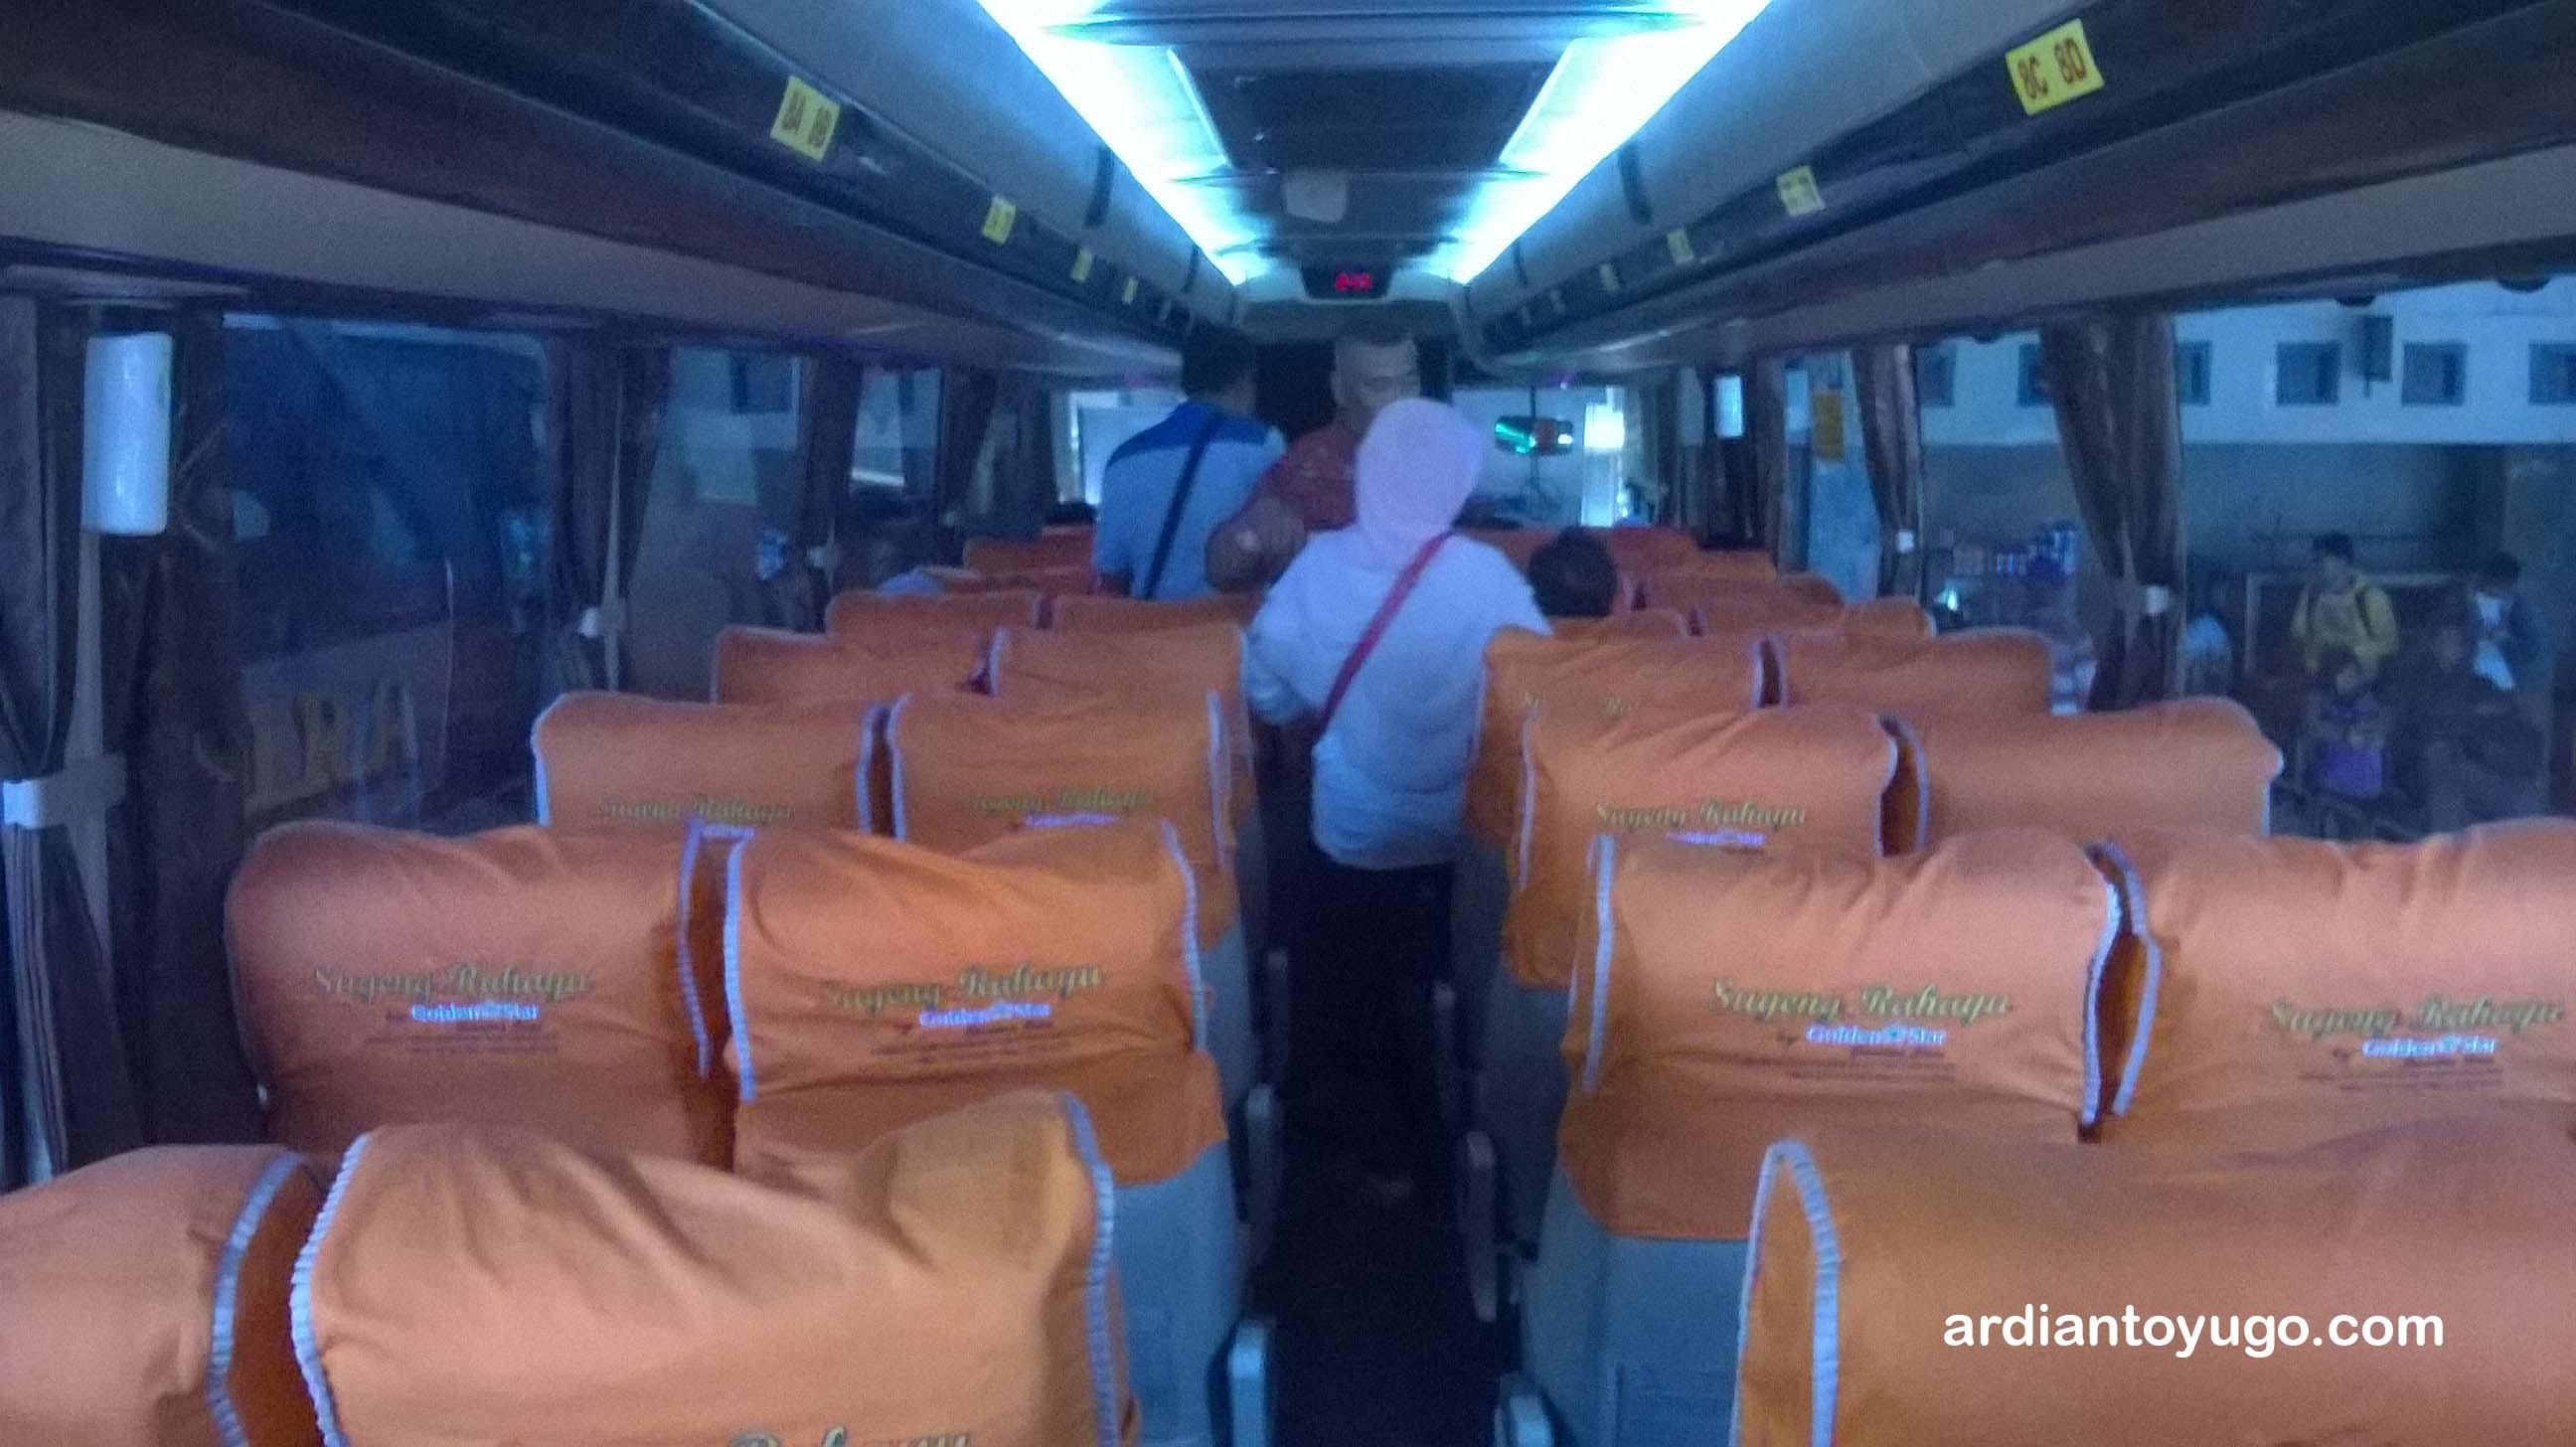 Sugeng Rahayu Golden Star Jet Darat Baru Jogja Surabaya